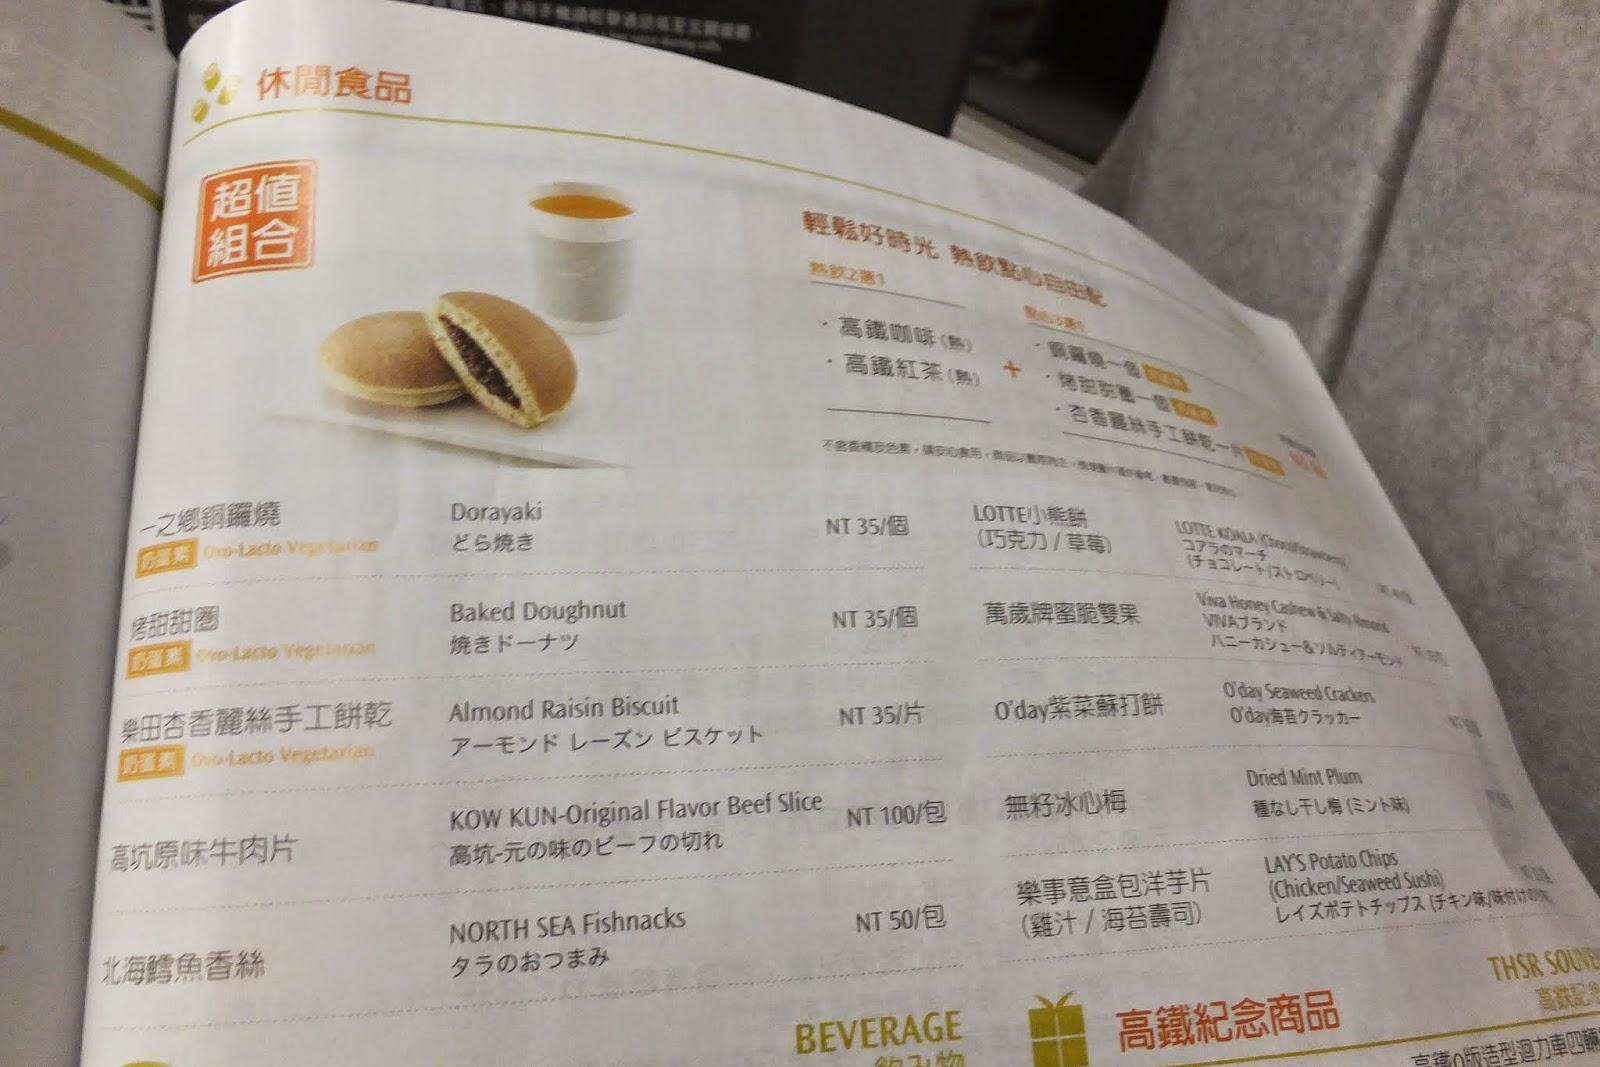 THSR menu2